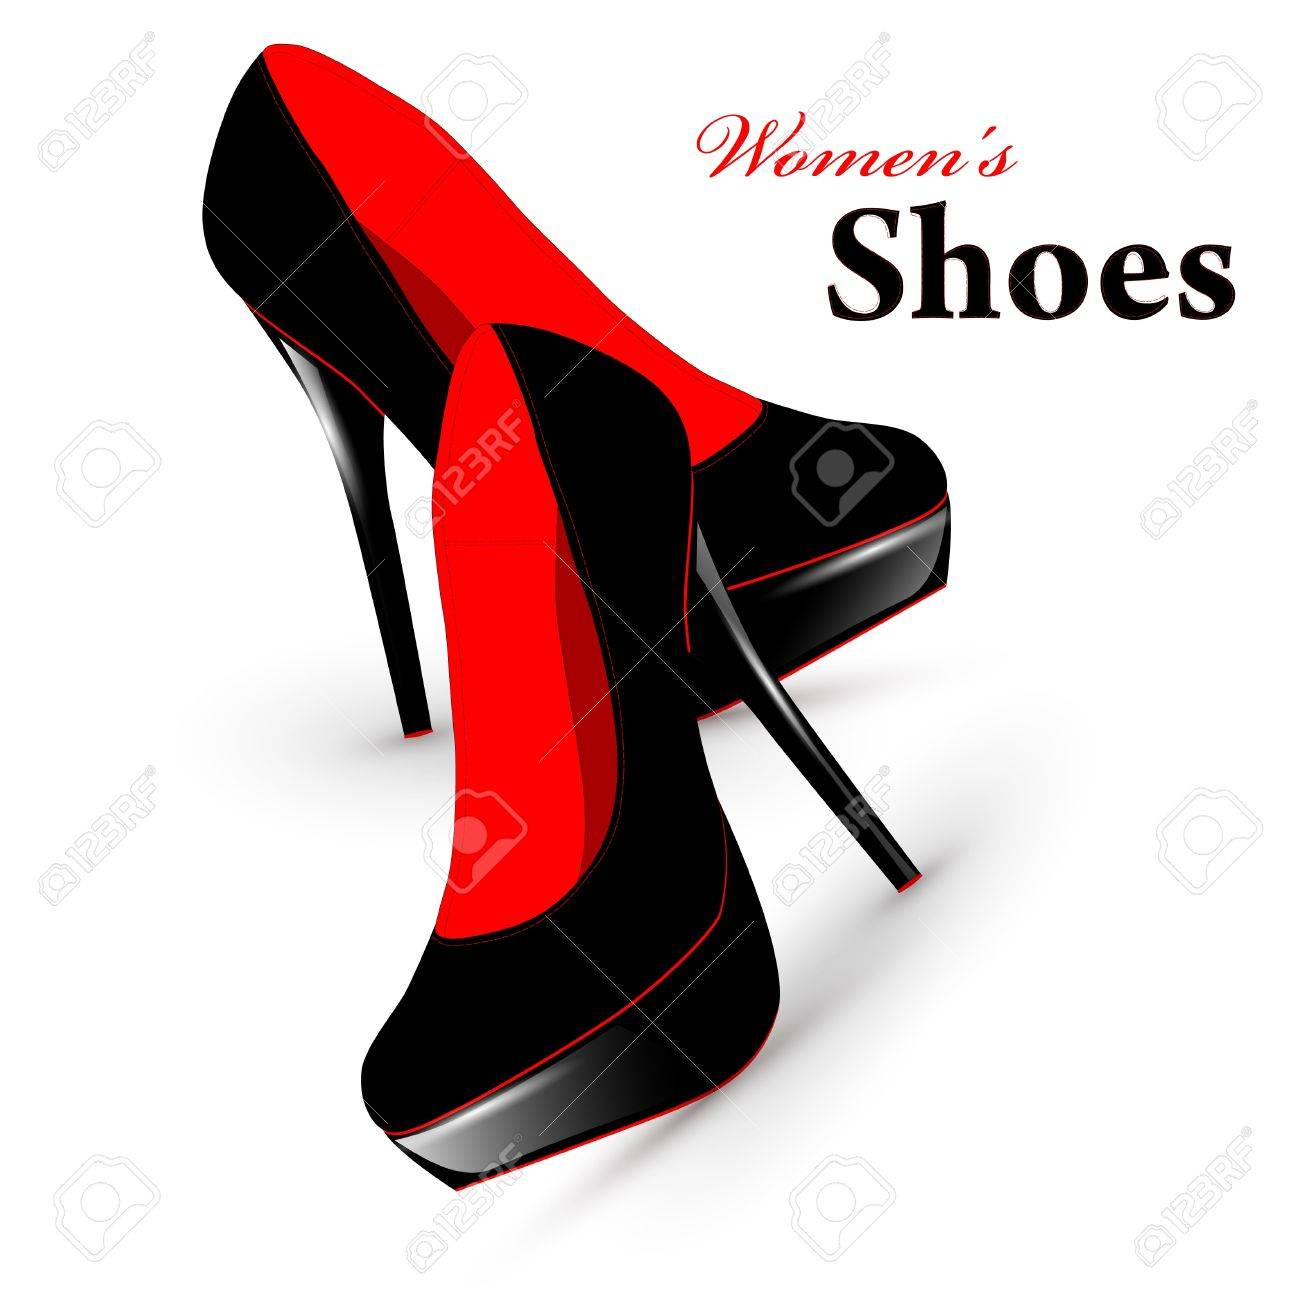 Illustration of fashion high heel woman shoes - 9505878